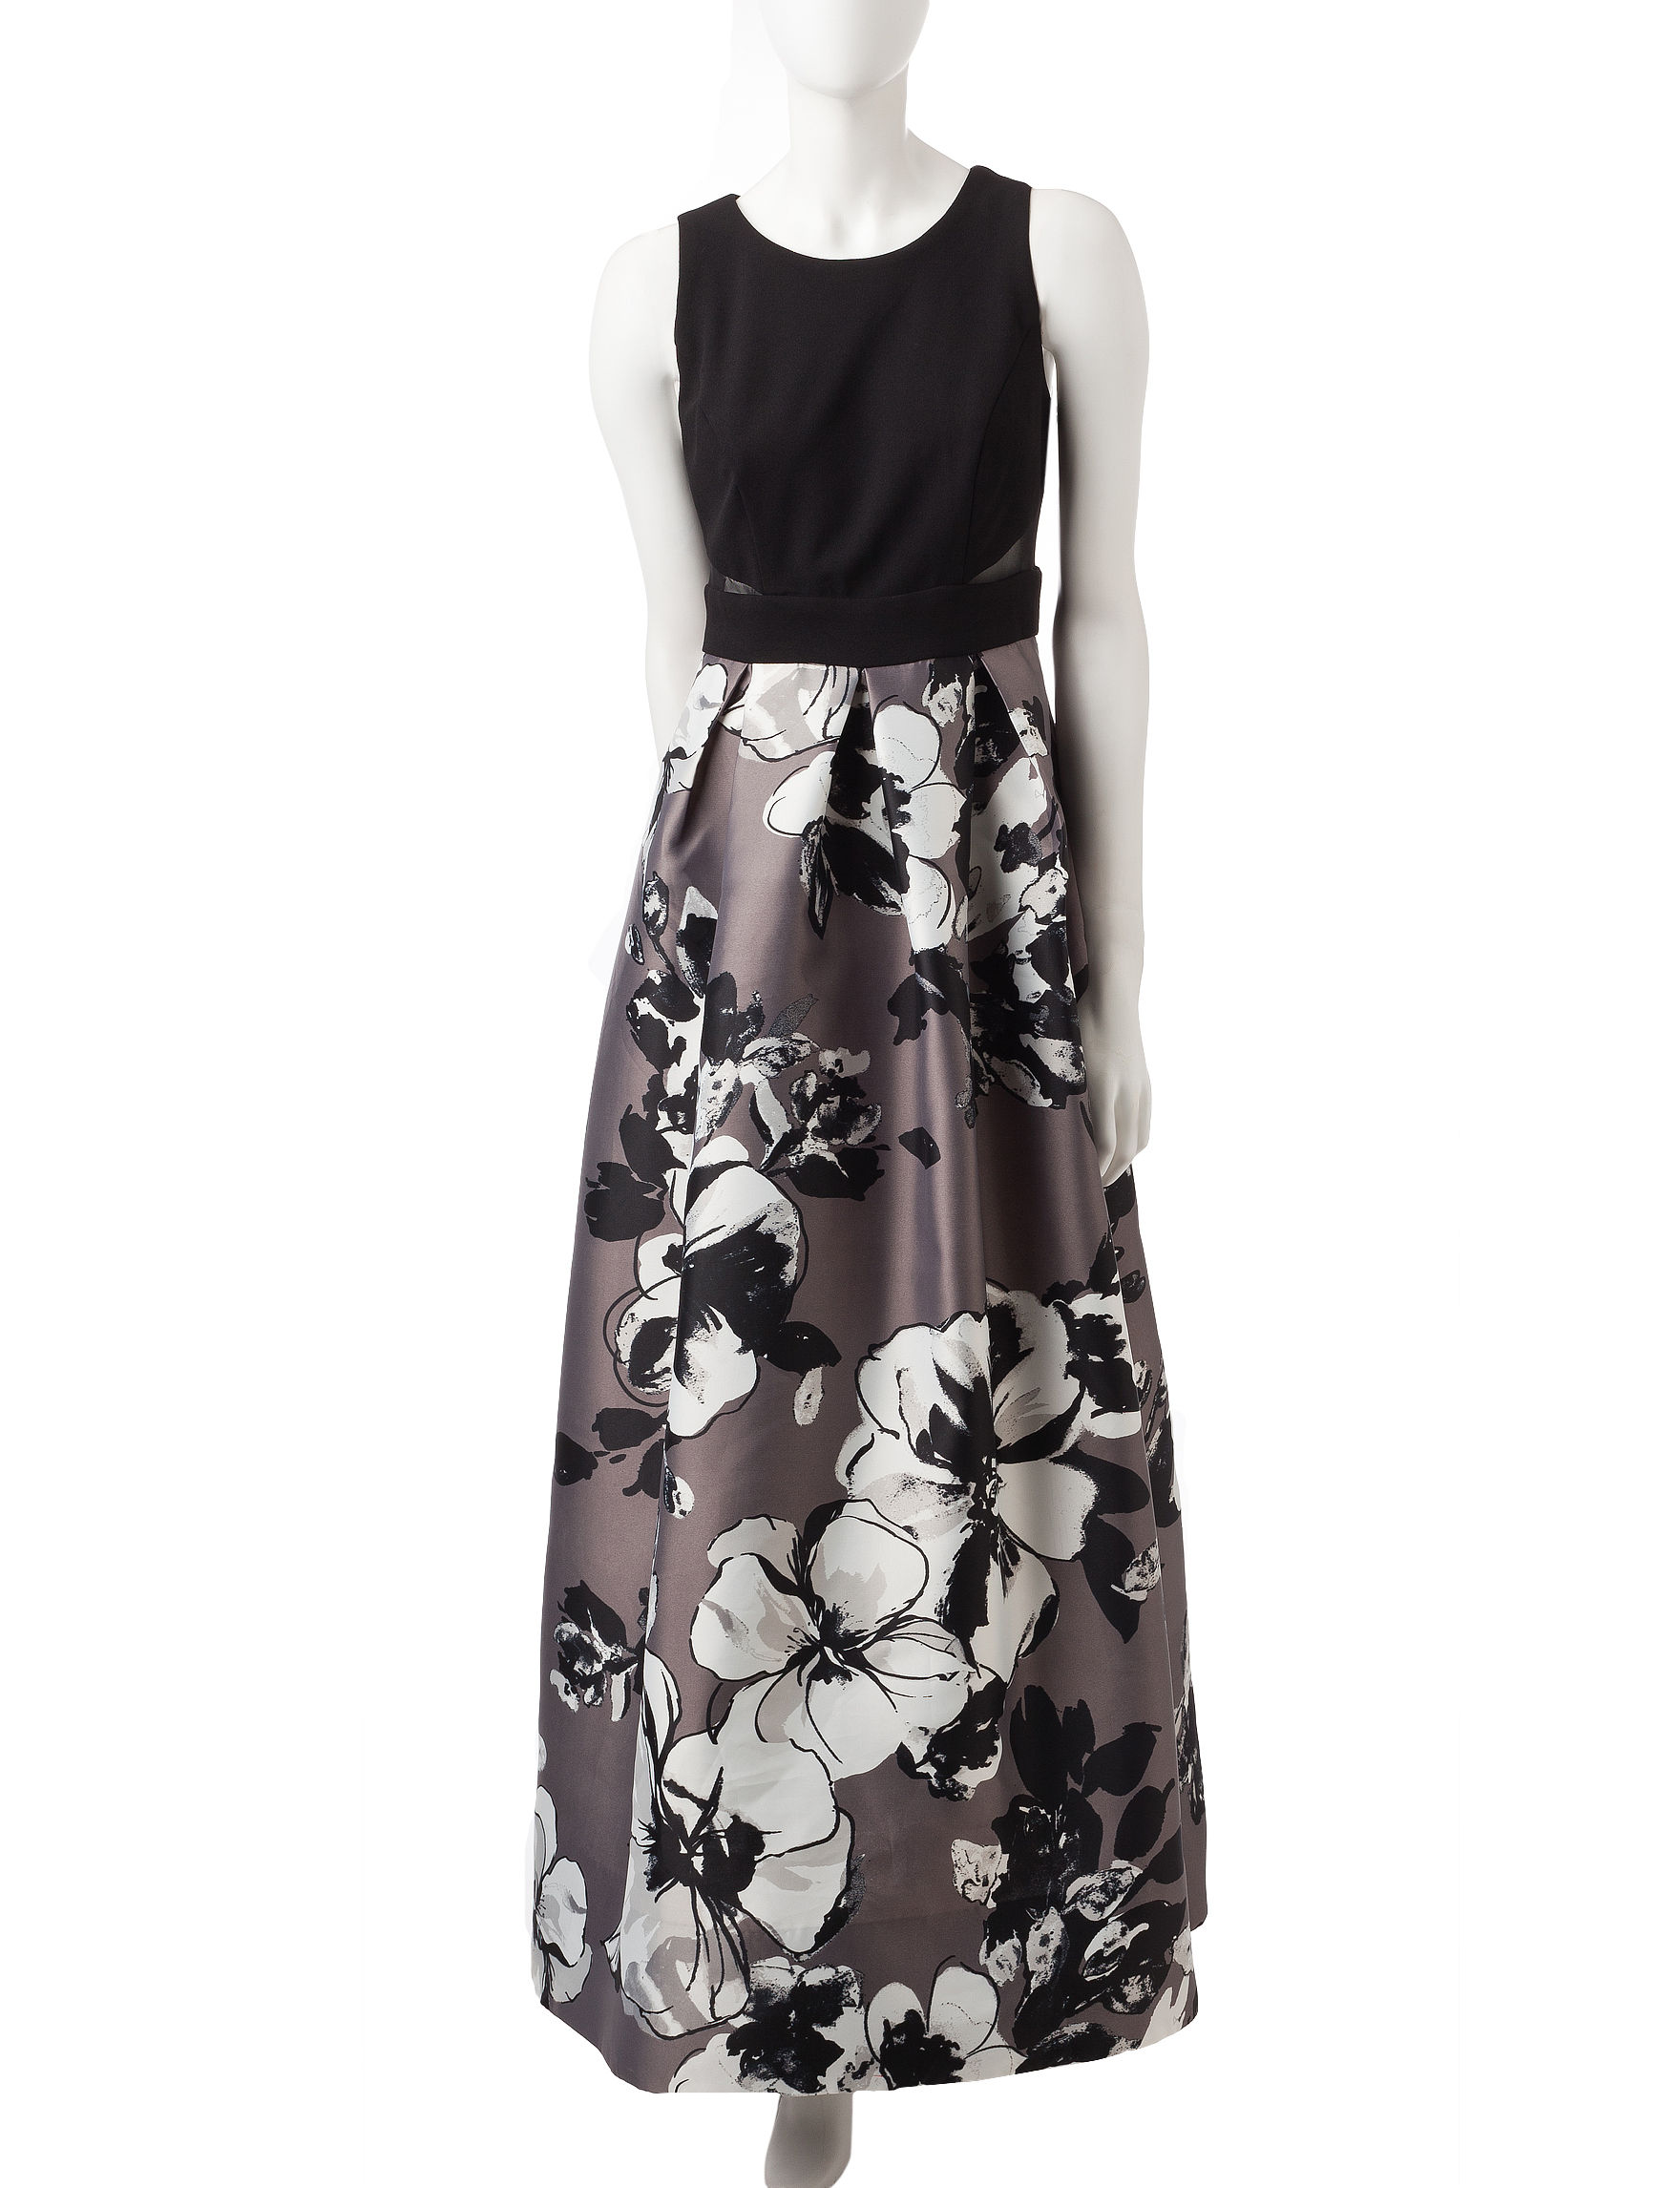 Sangria Black Cocktail & Party Evening & Formal A-line Dresses Fit & Flare Dresses